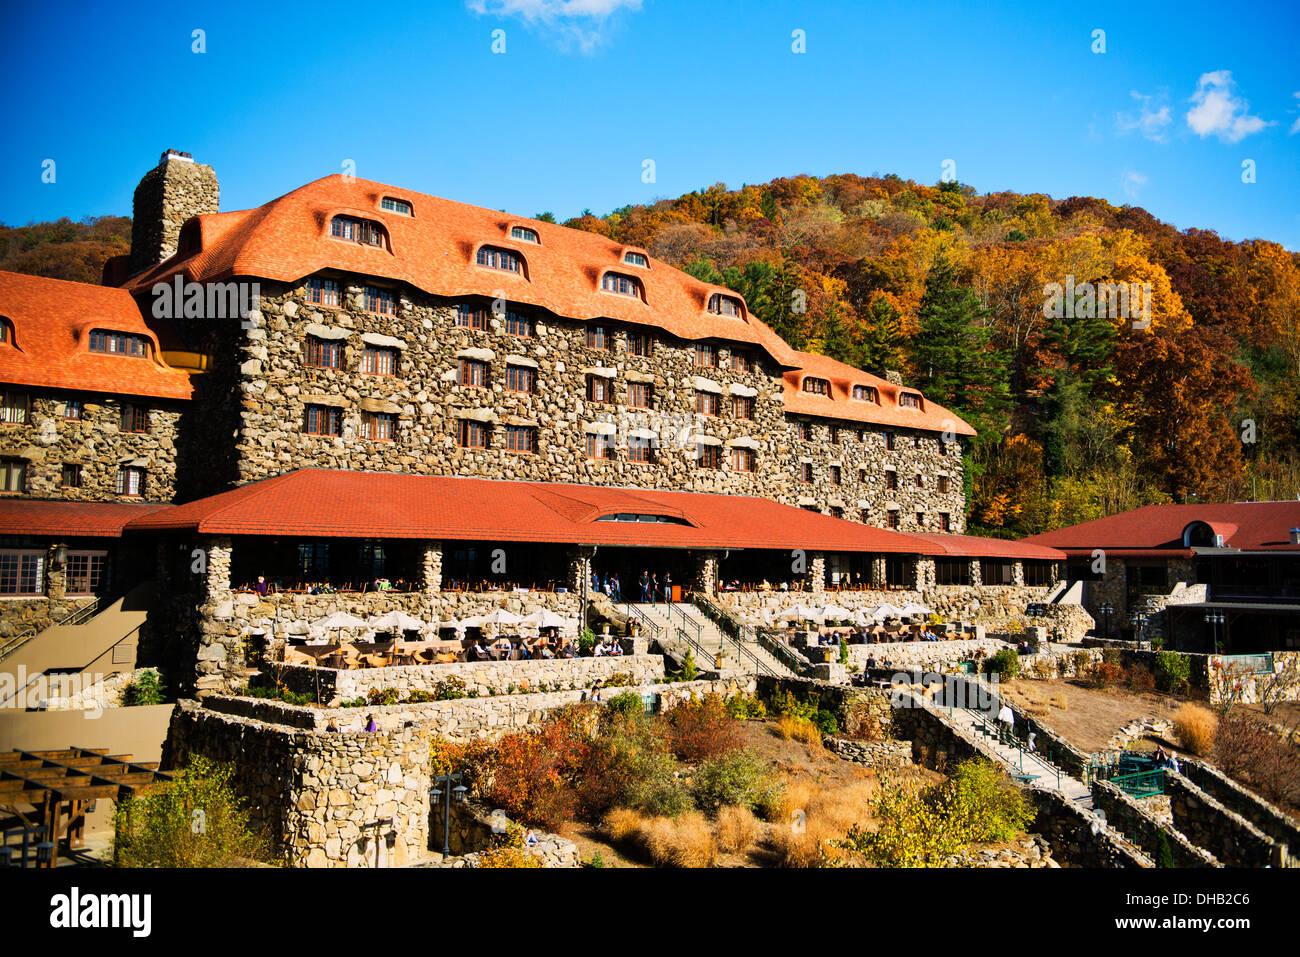 Autumn colors at the Grove Park Inn Asheville North Carolina - Stock Image